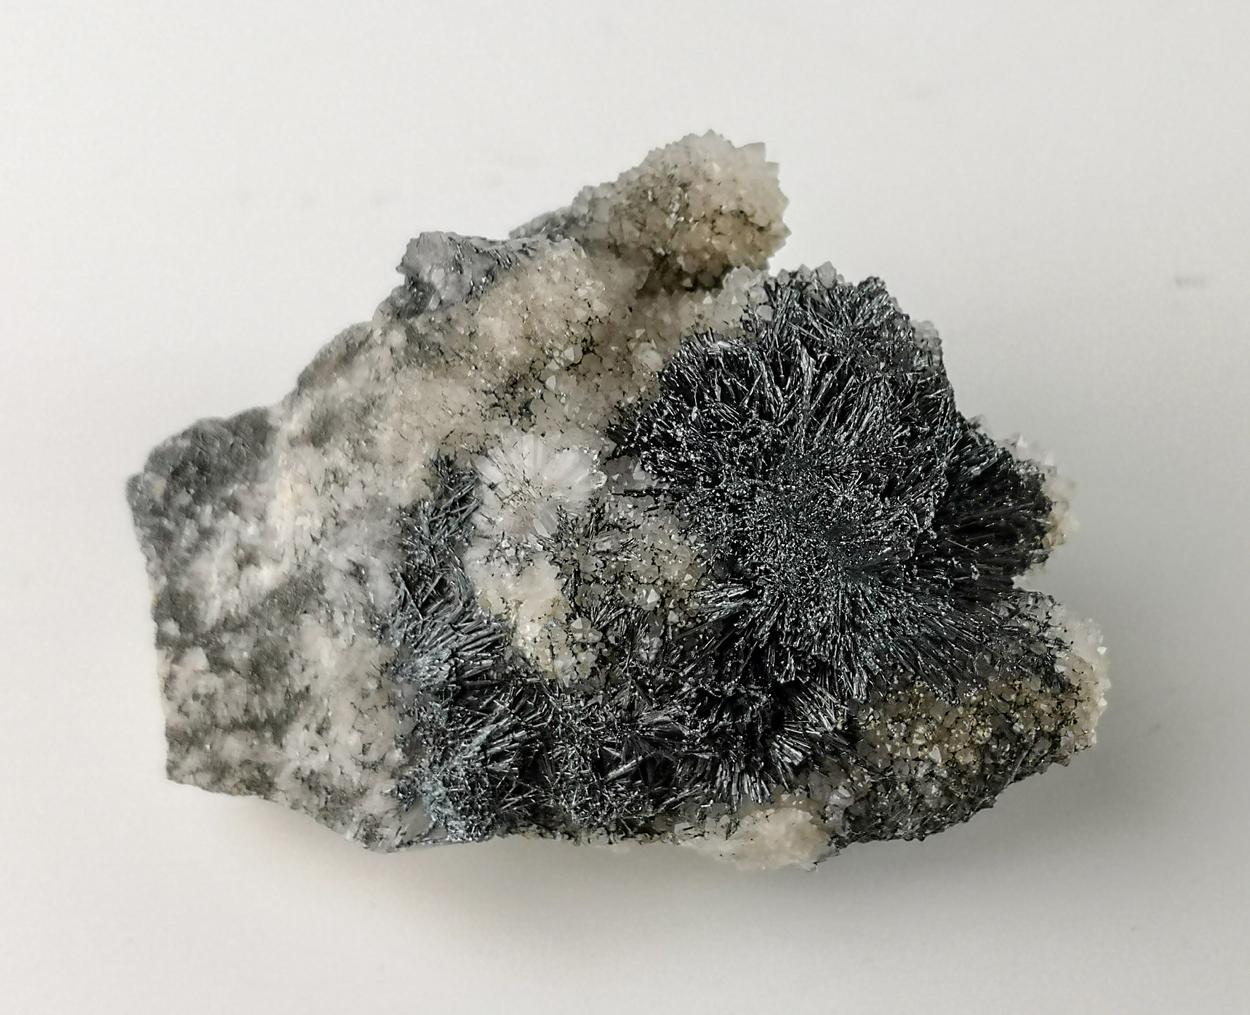 Zinkenite